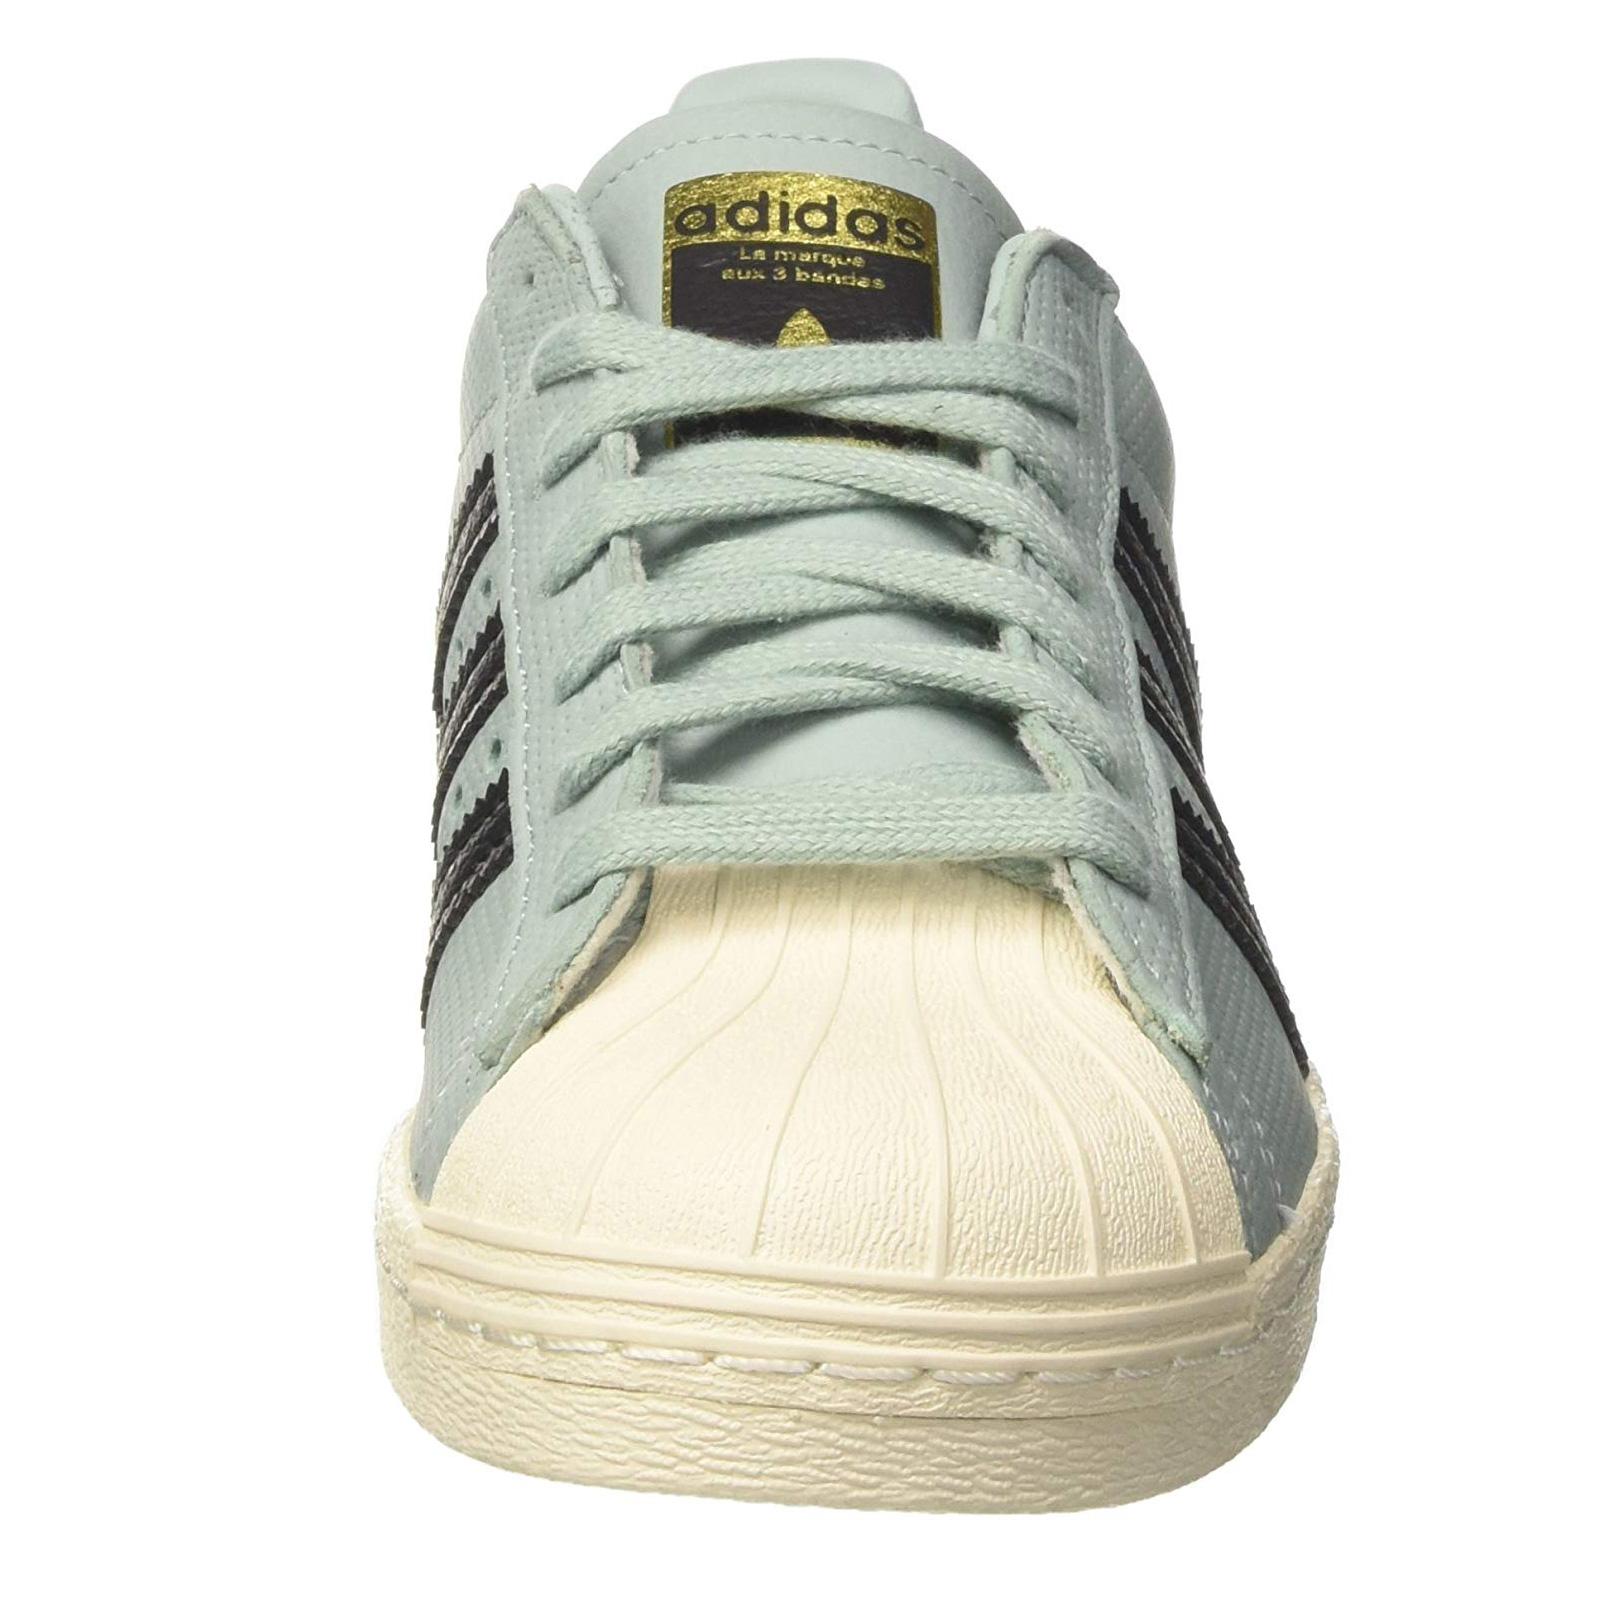 quality design ef1d1 8a6f9 Adidas Superstar 80s Schuhe Retro Sneaker BZ0143 Tactile Green Blau-Grün